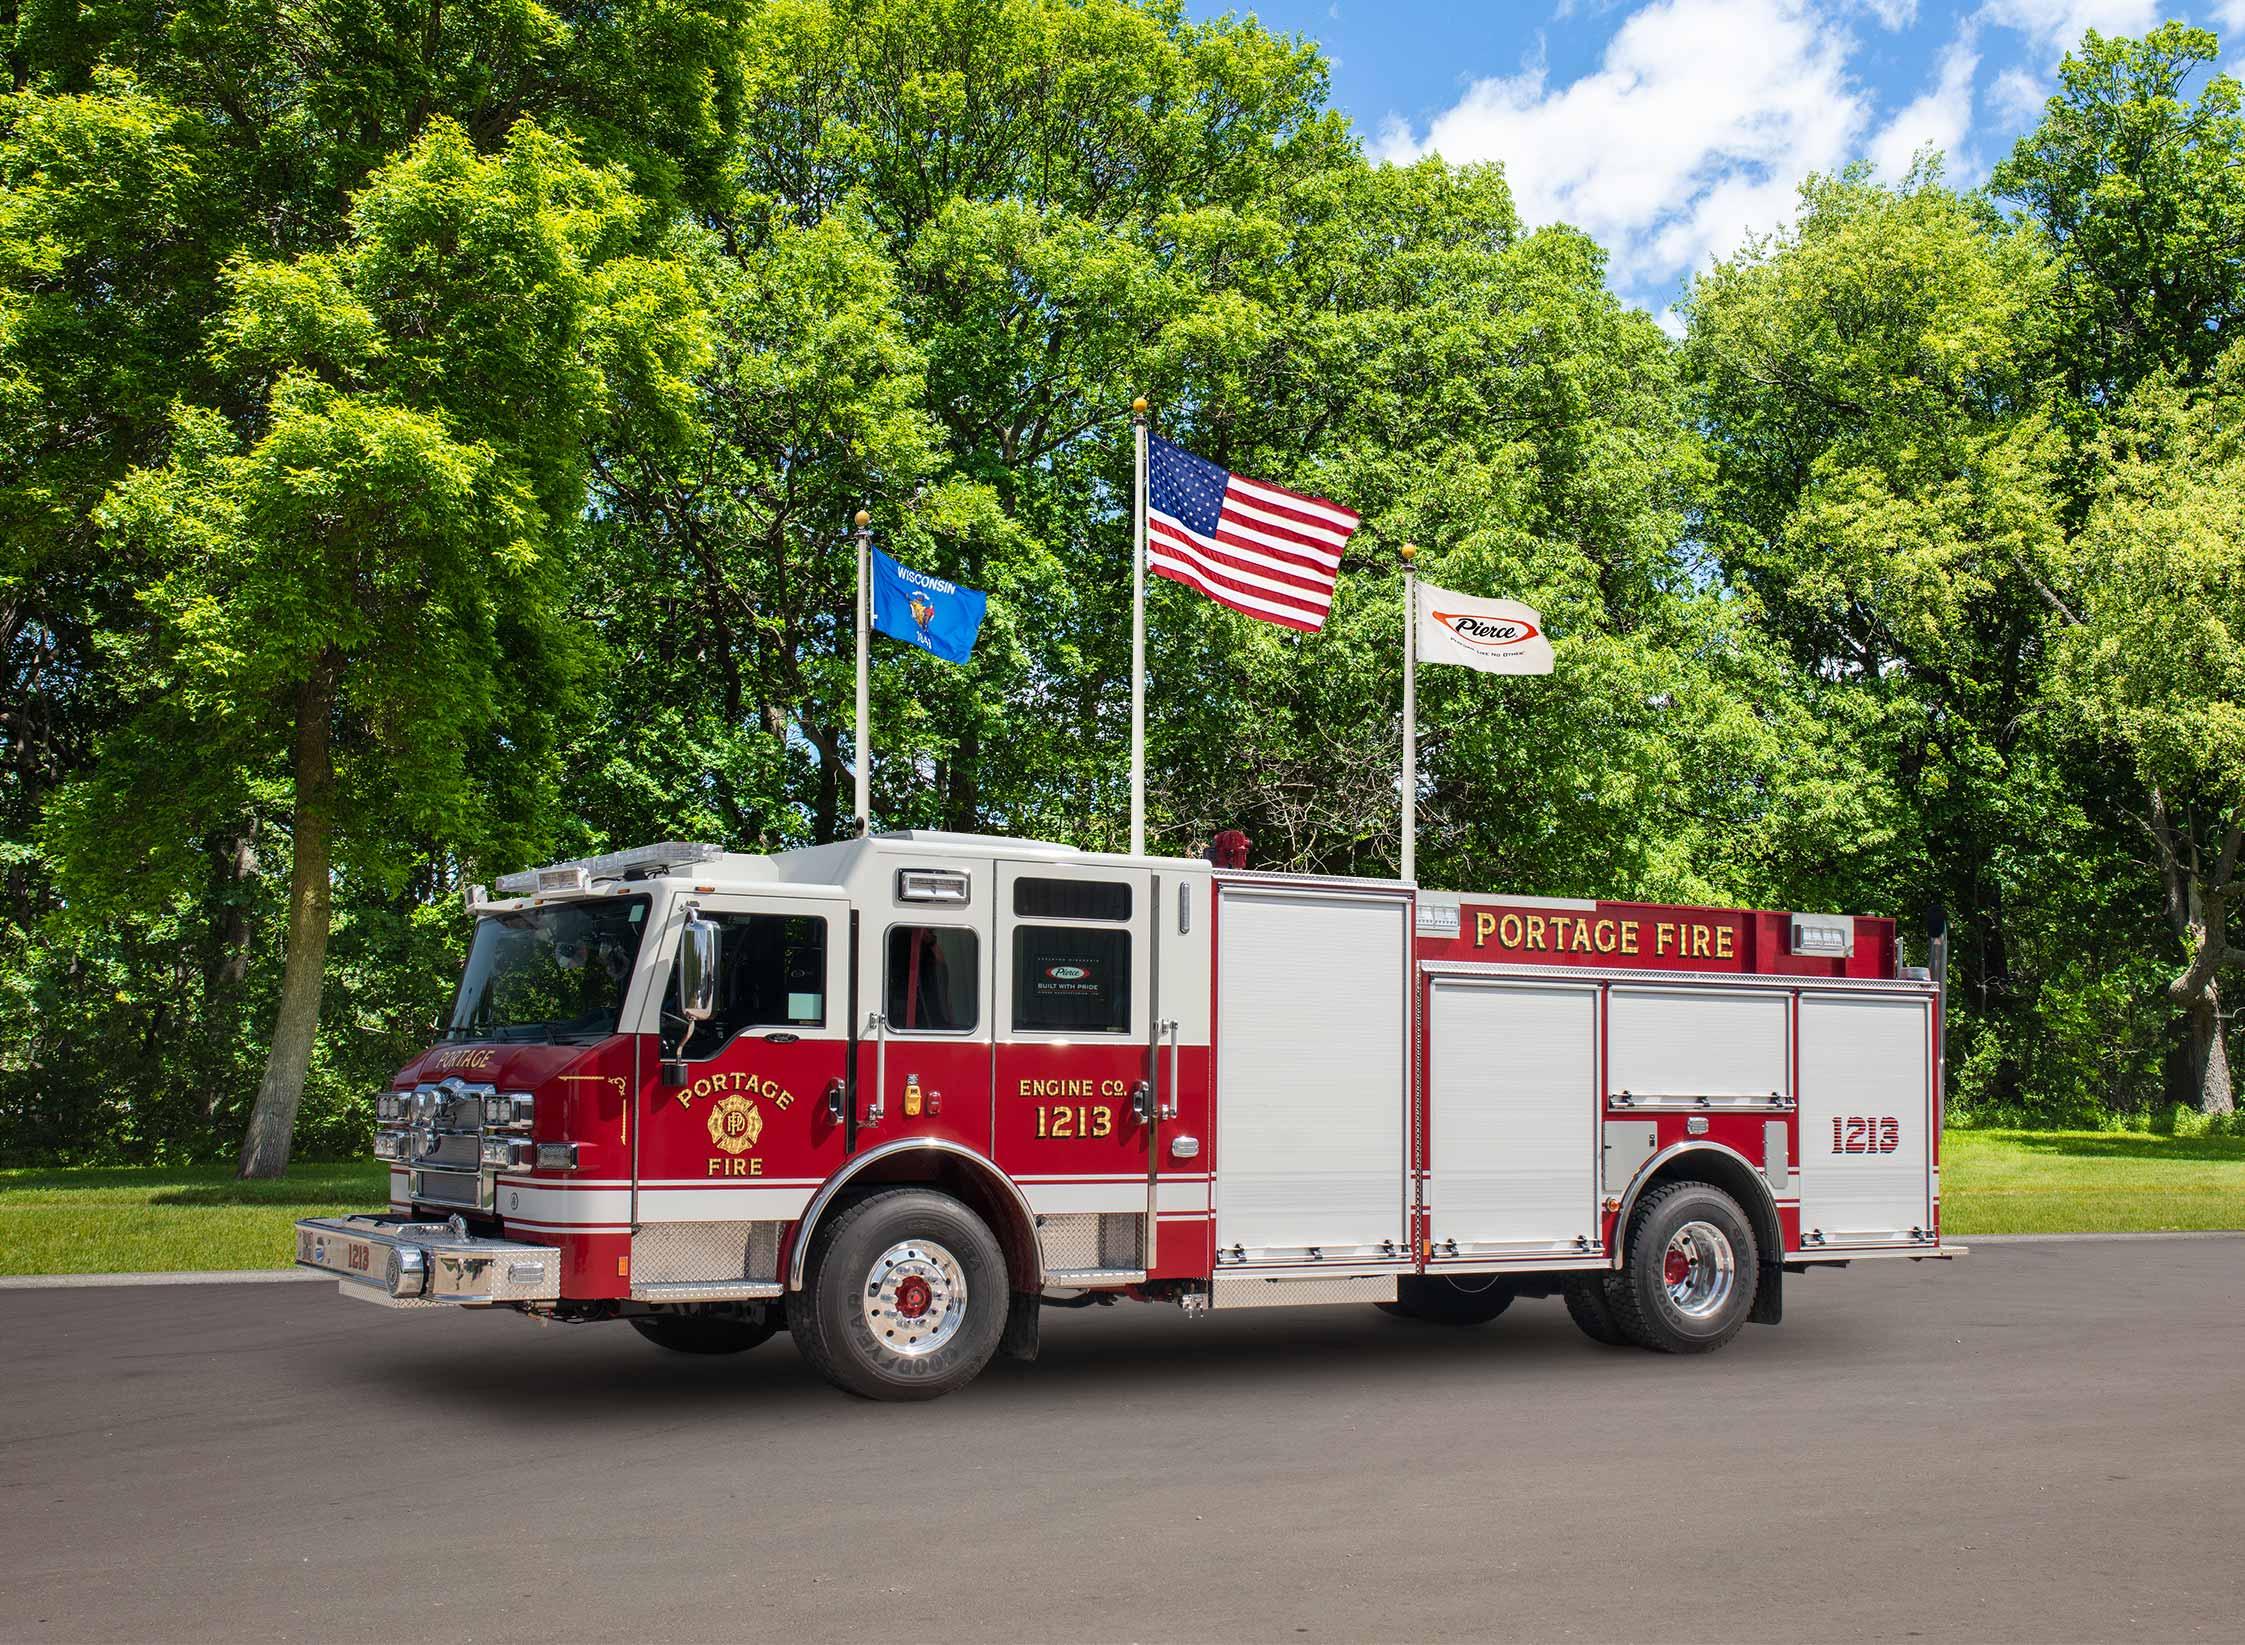 City of Portage Fire Department - Pumper